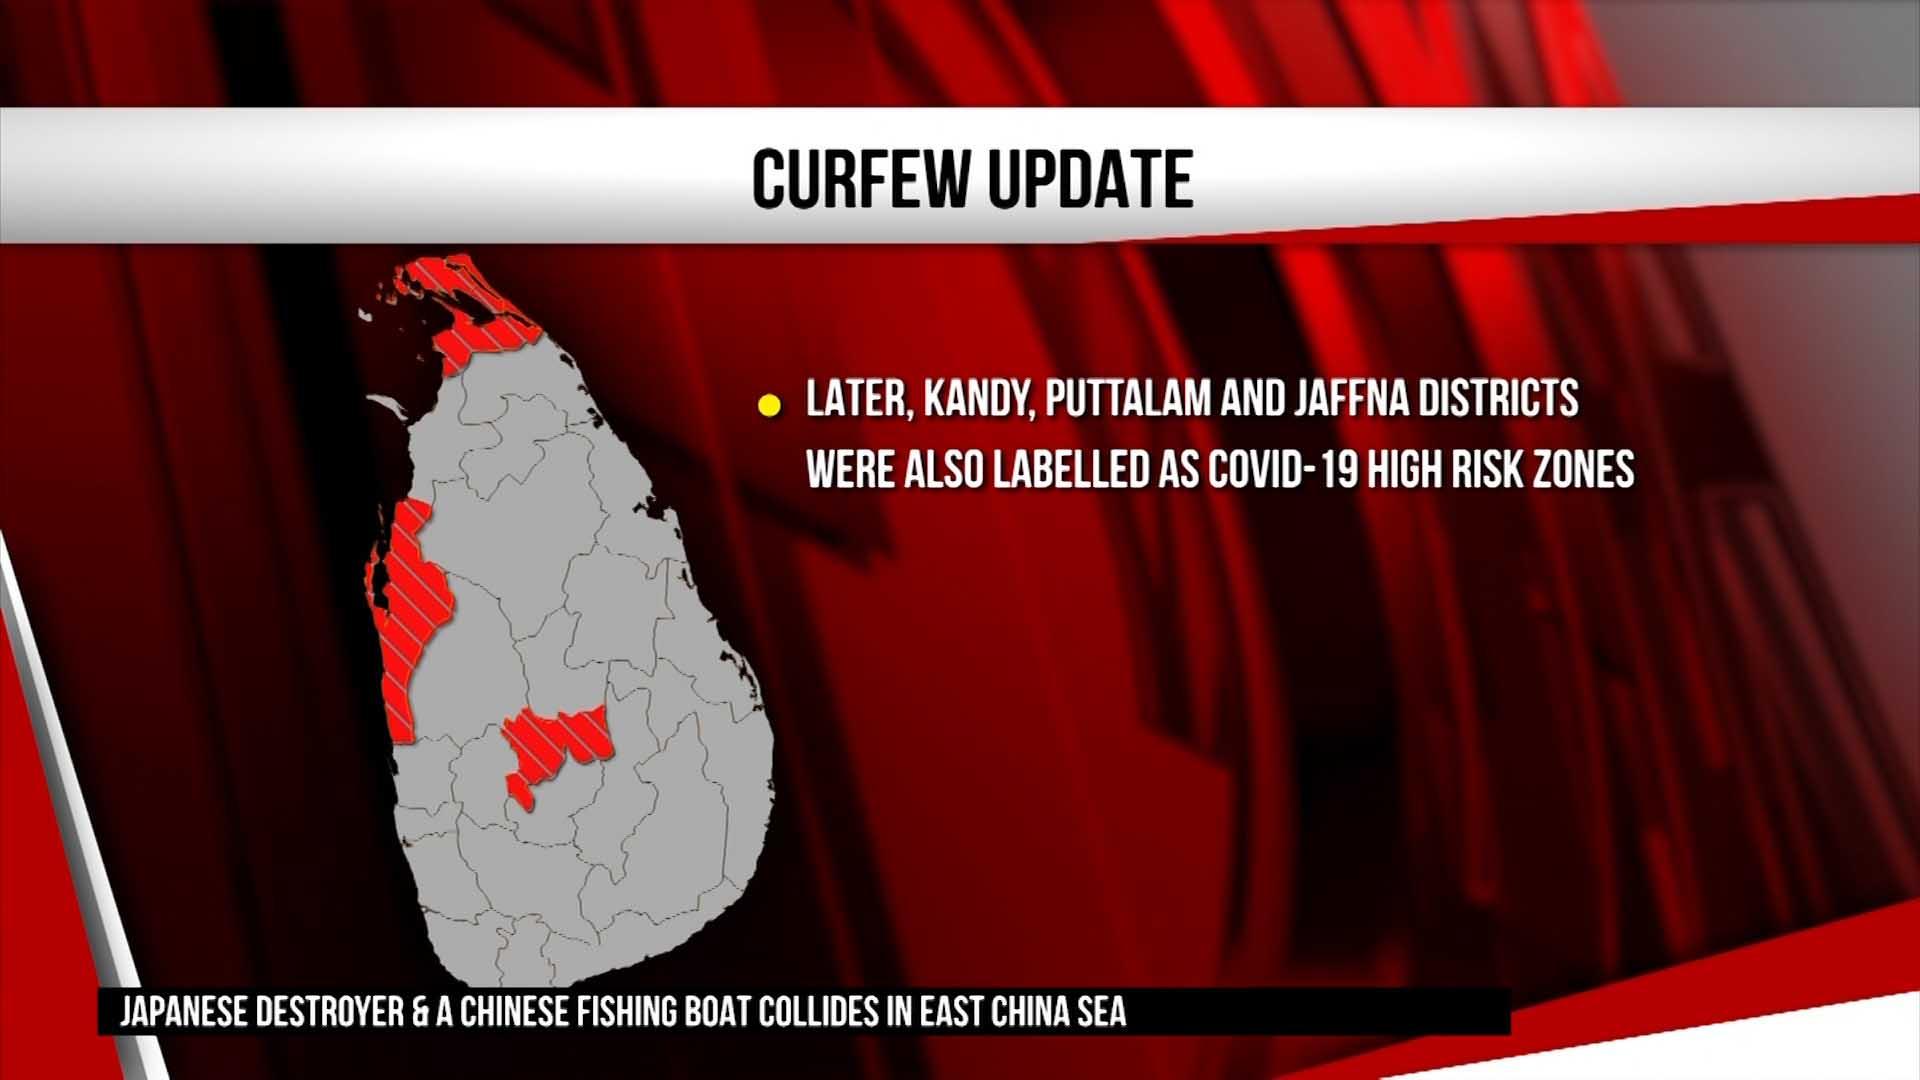 Sri Lanka Police warns of strict action against violators of curfew (English)